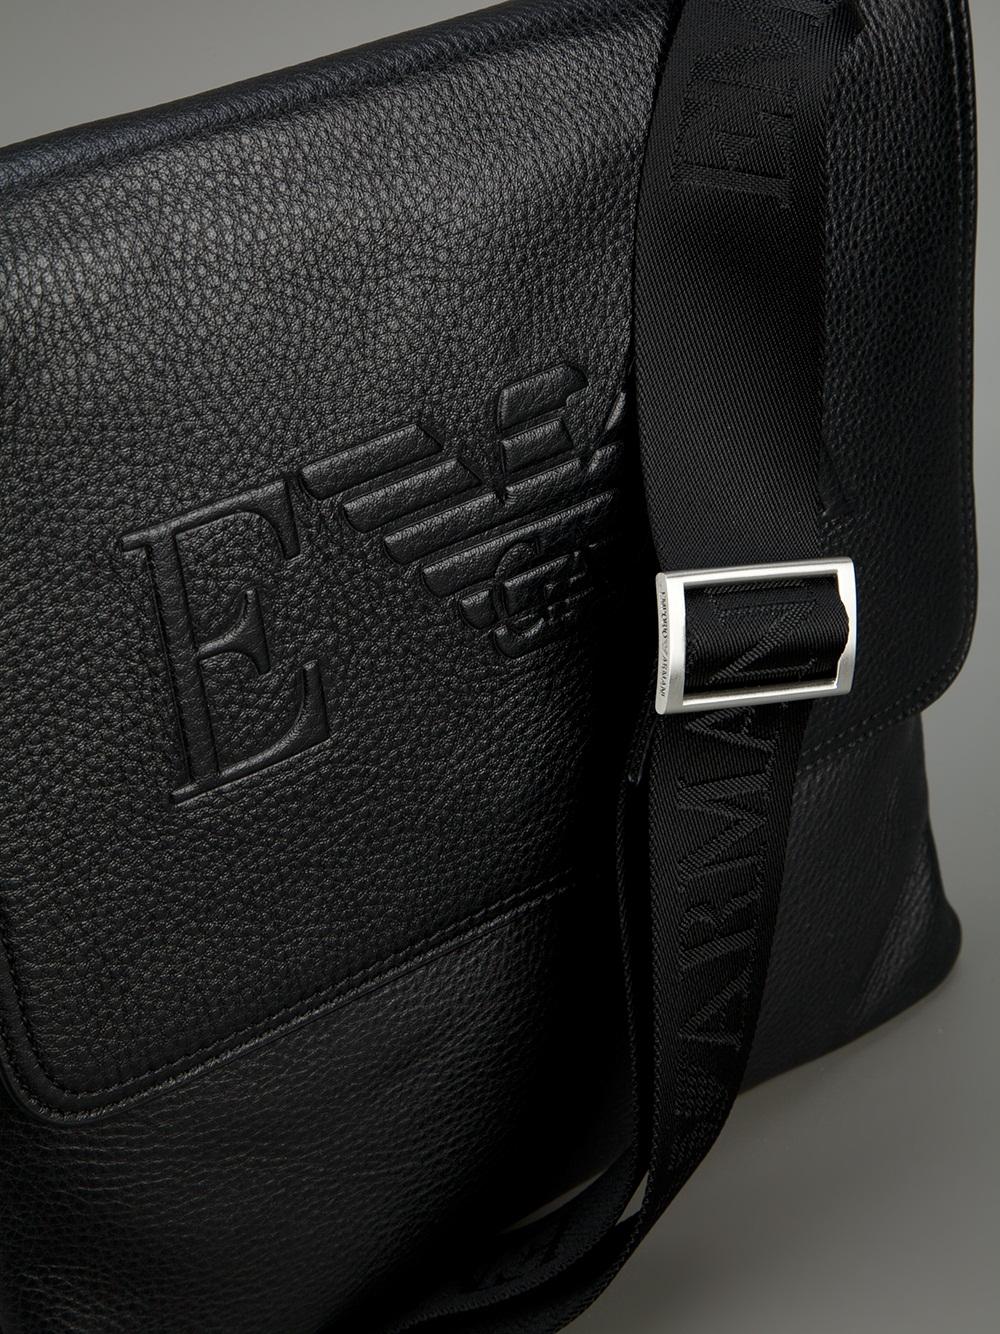 Lyst Emporio Armani Cross Body Shoulder Bag In Black For Men